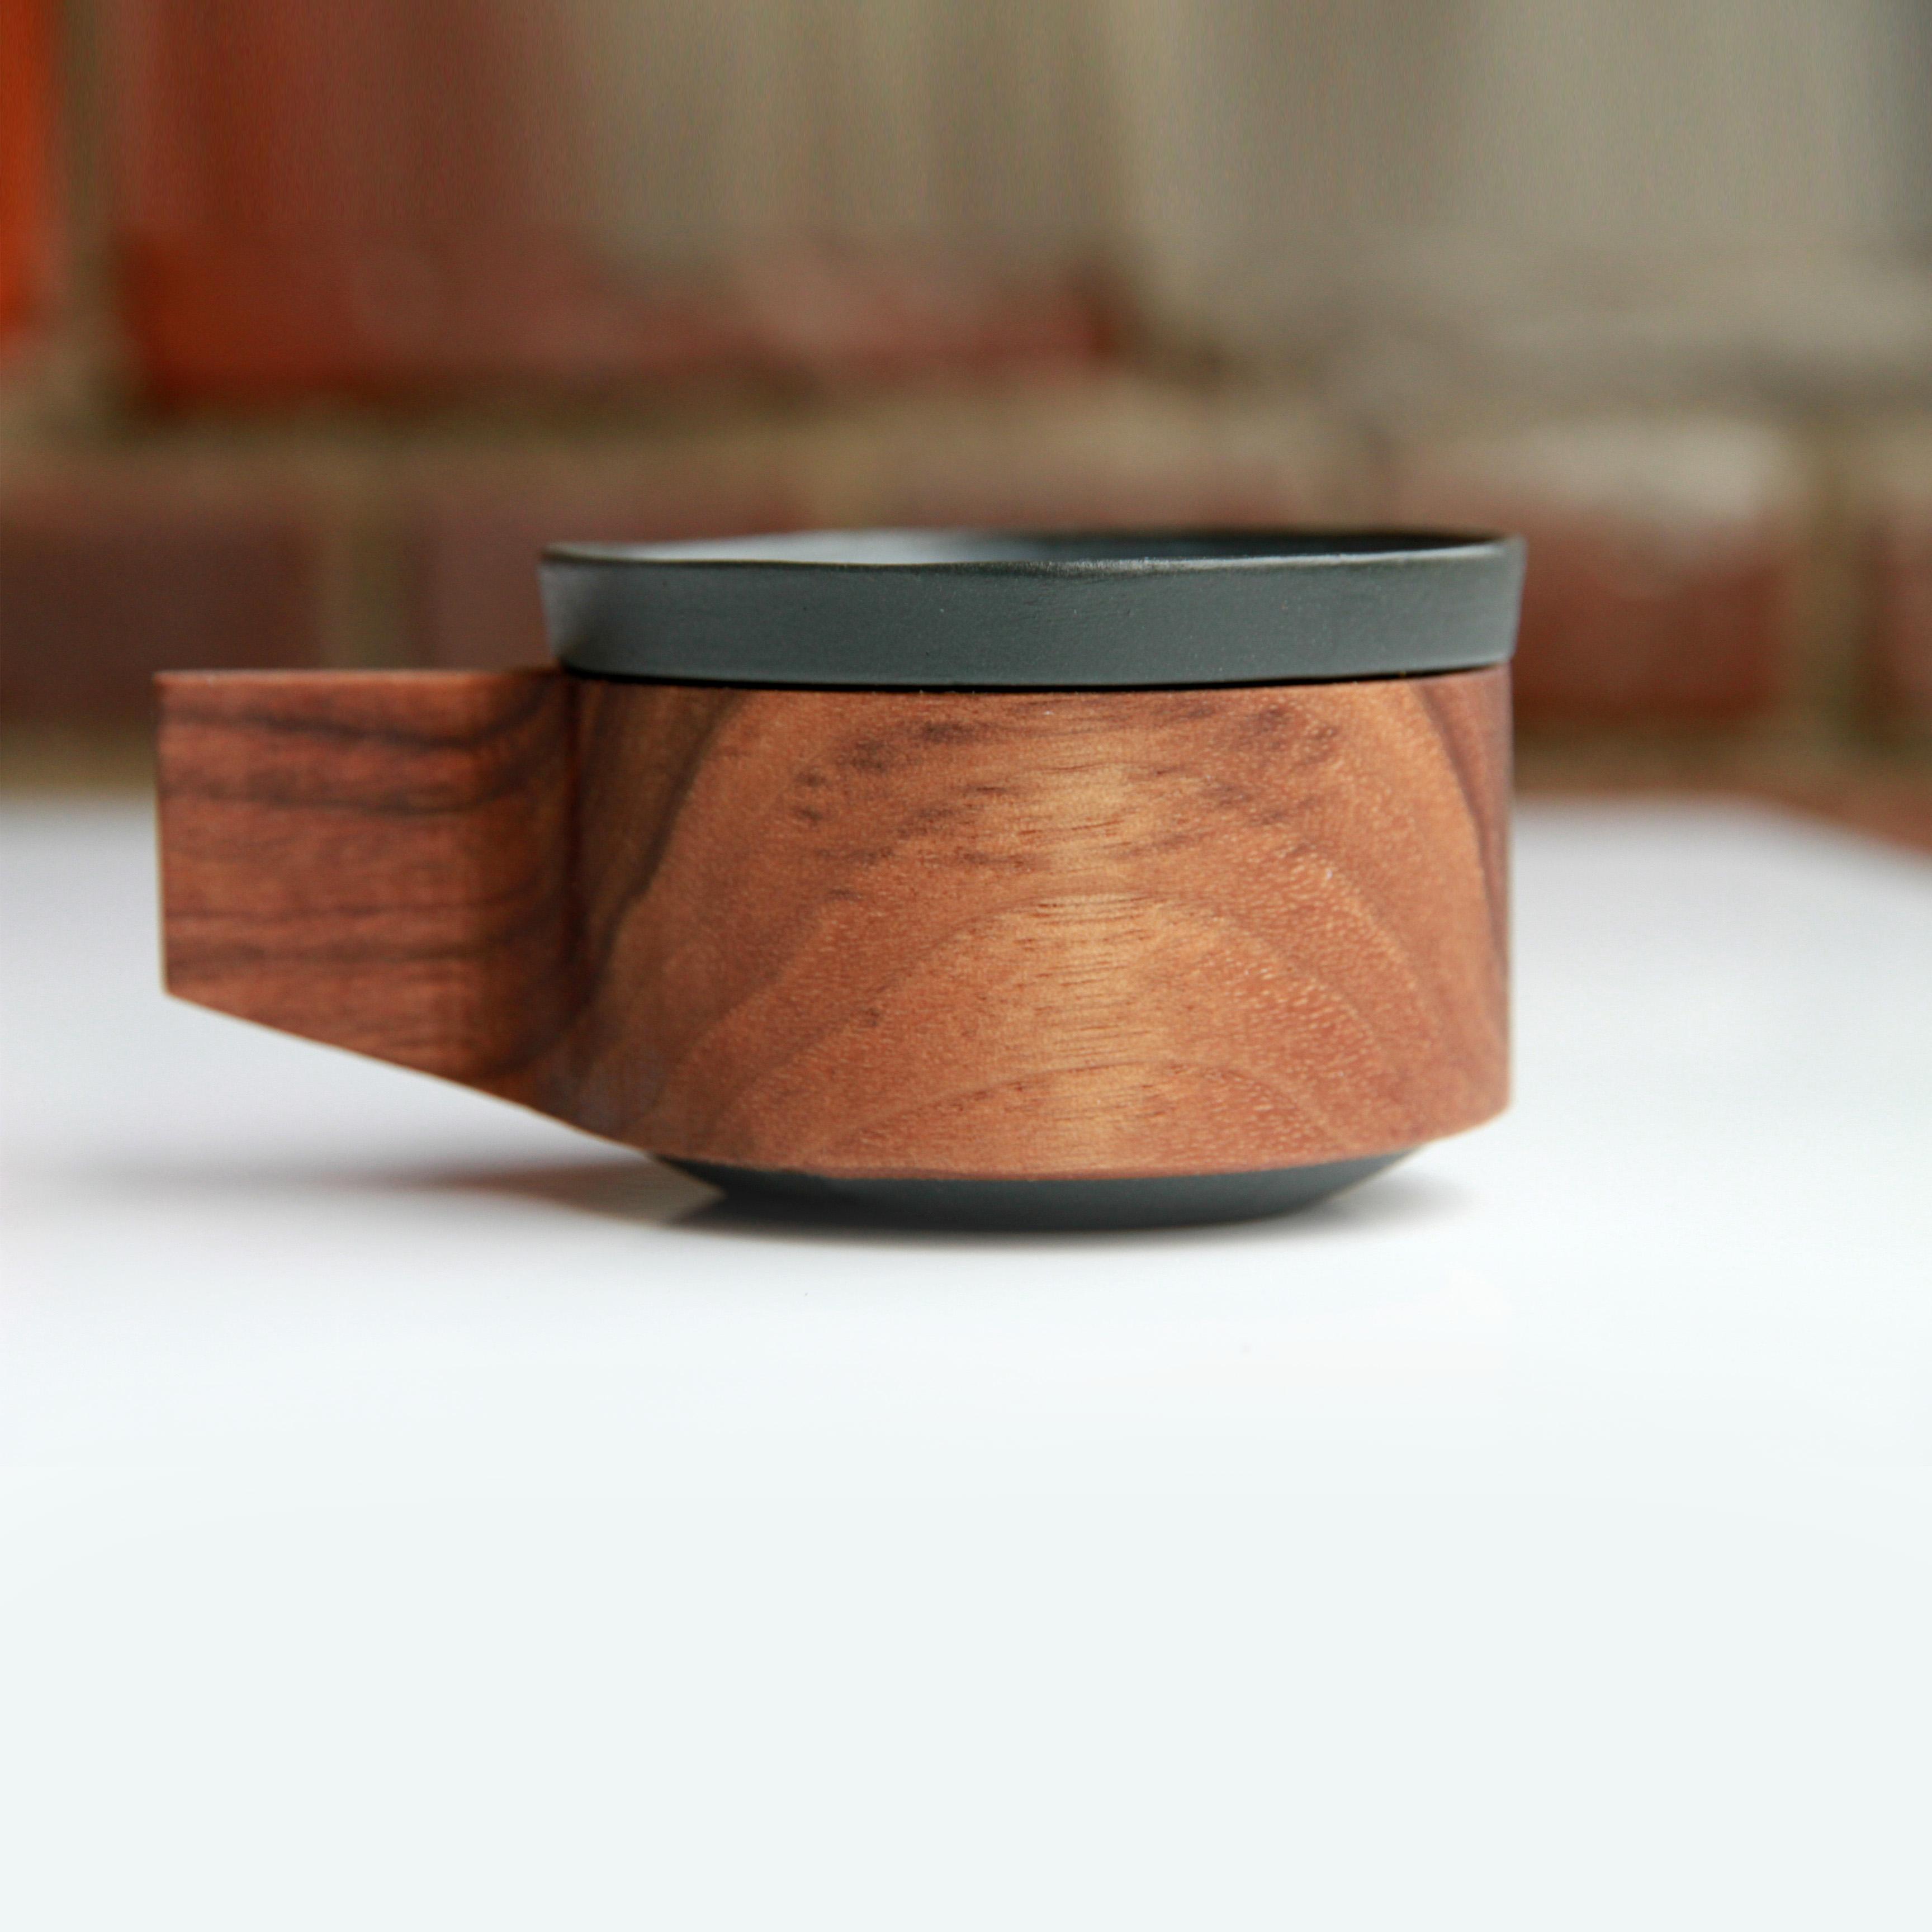 ubu-design-tasse-cafe-espresso-grise-boi